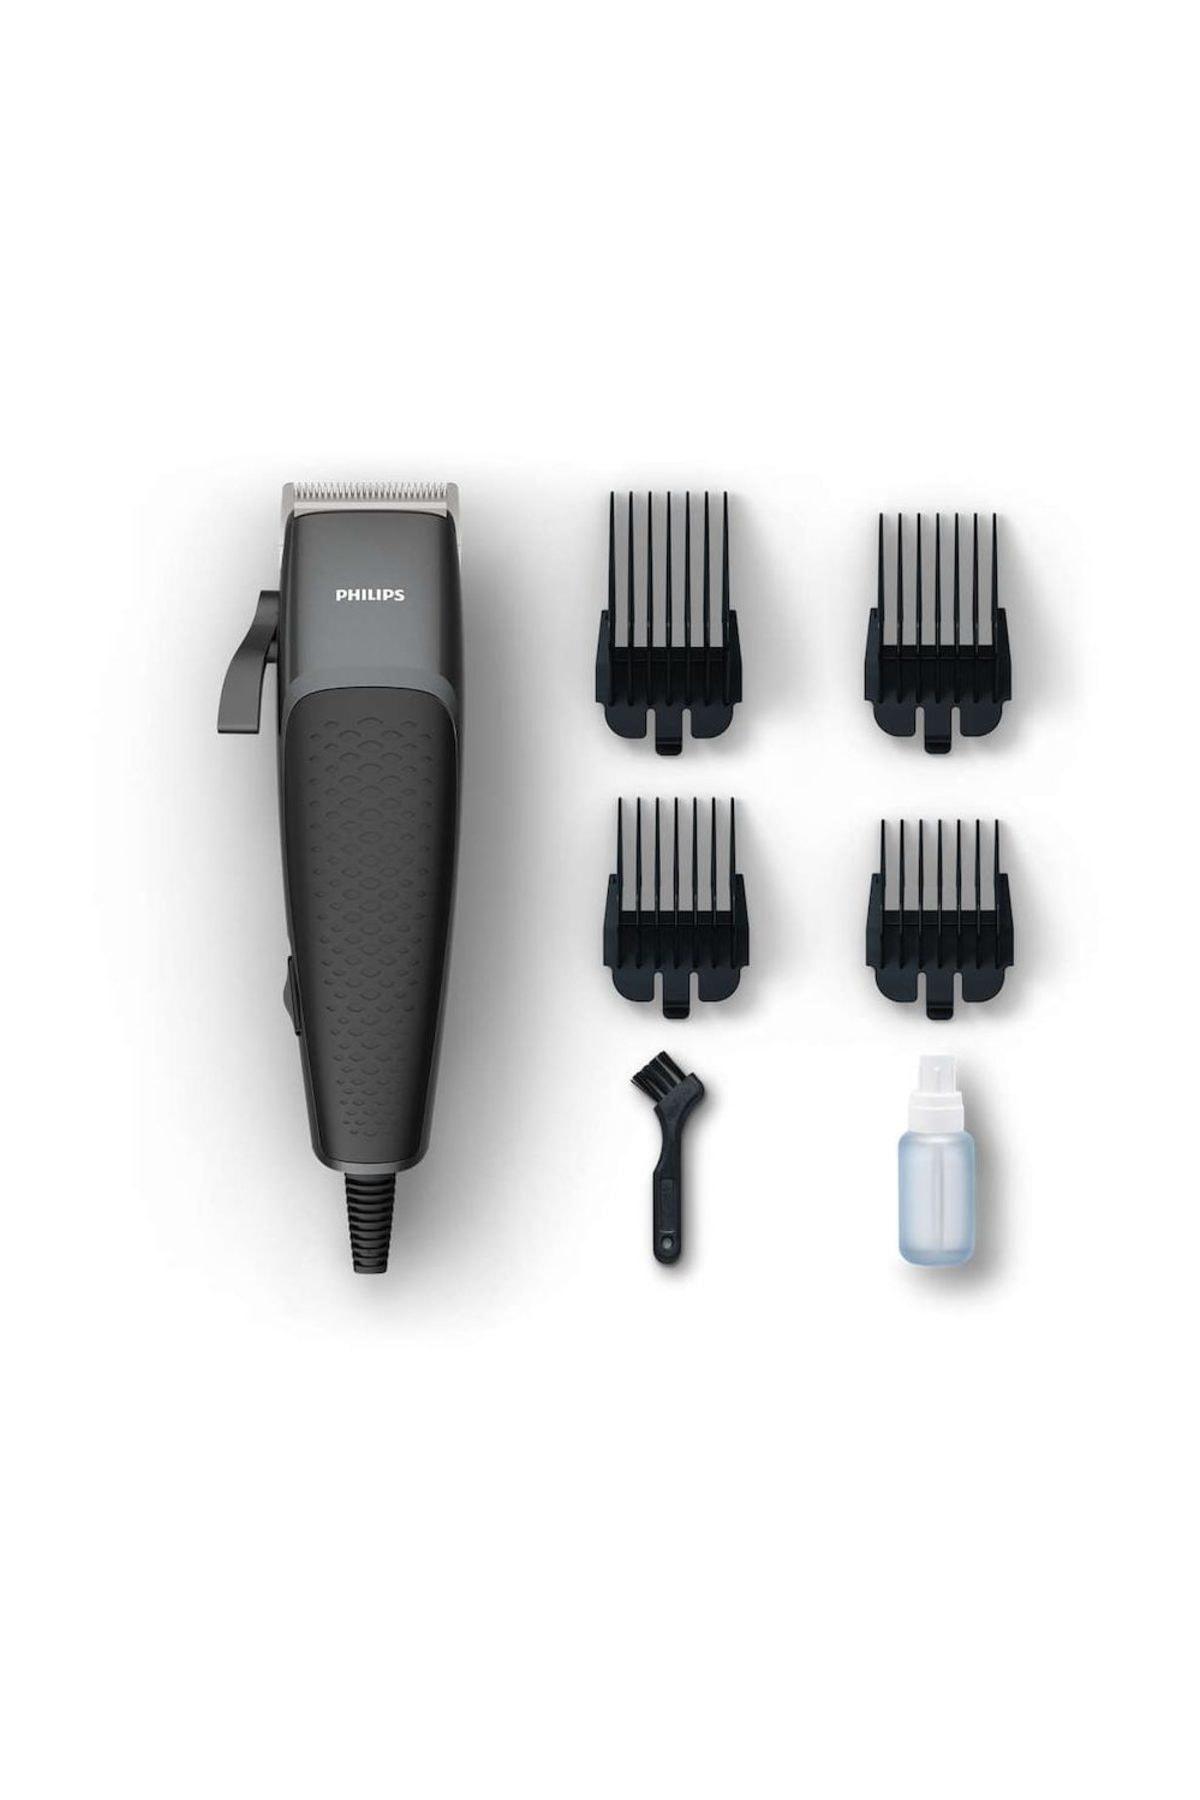 Philips Hairclipper Series 3000 Hc3100/15 Saç Kesme Makinesi 10054603 1